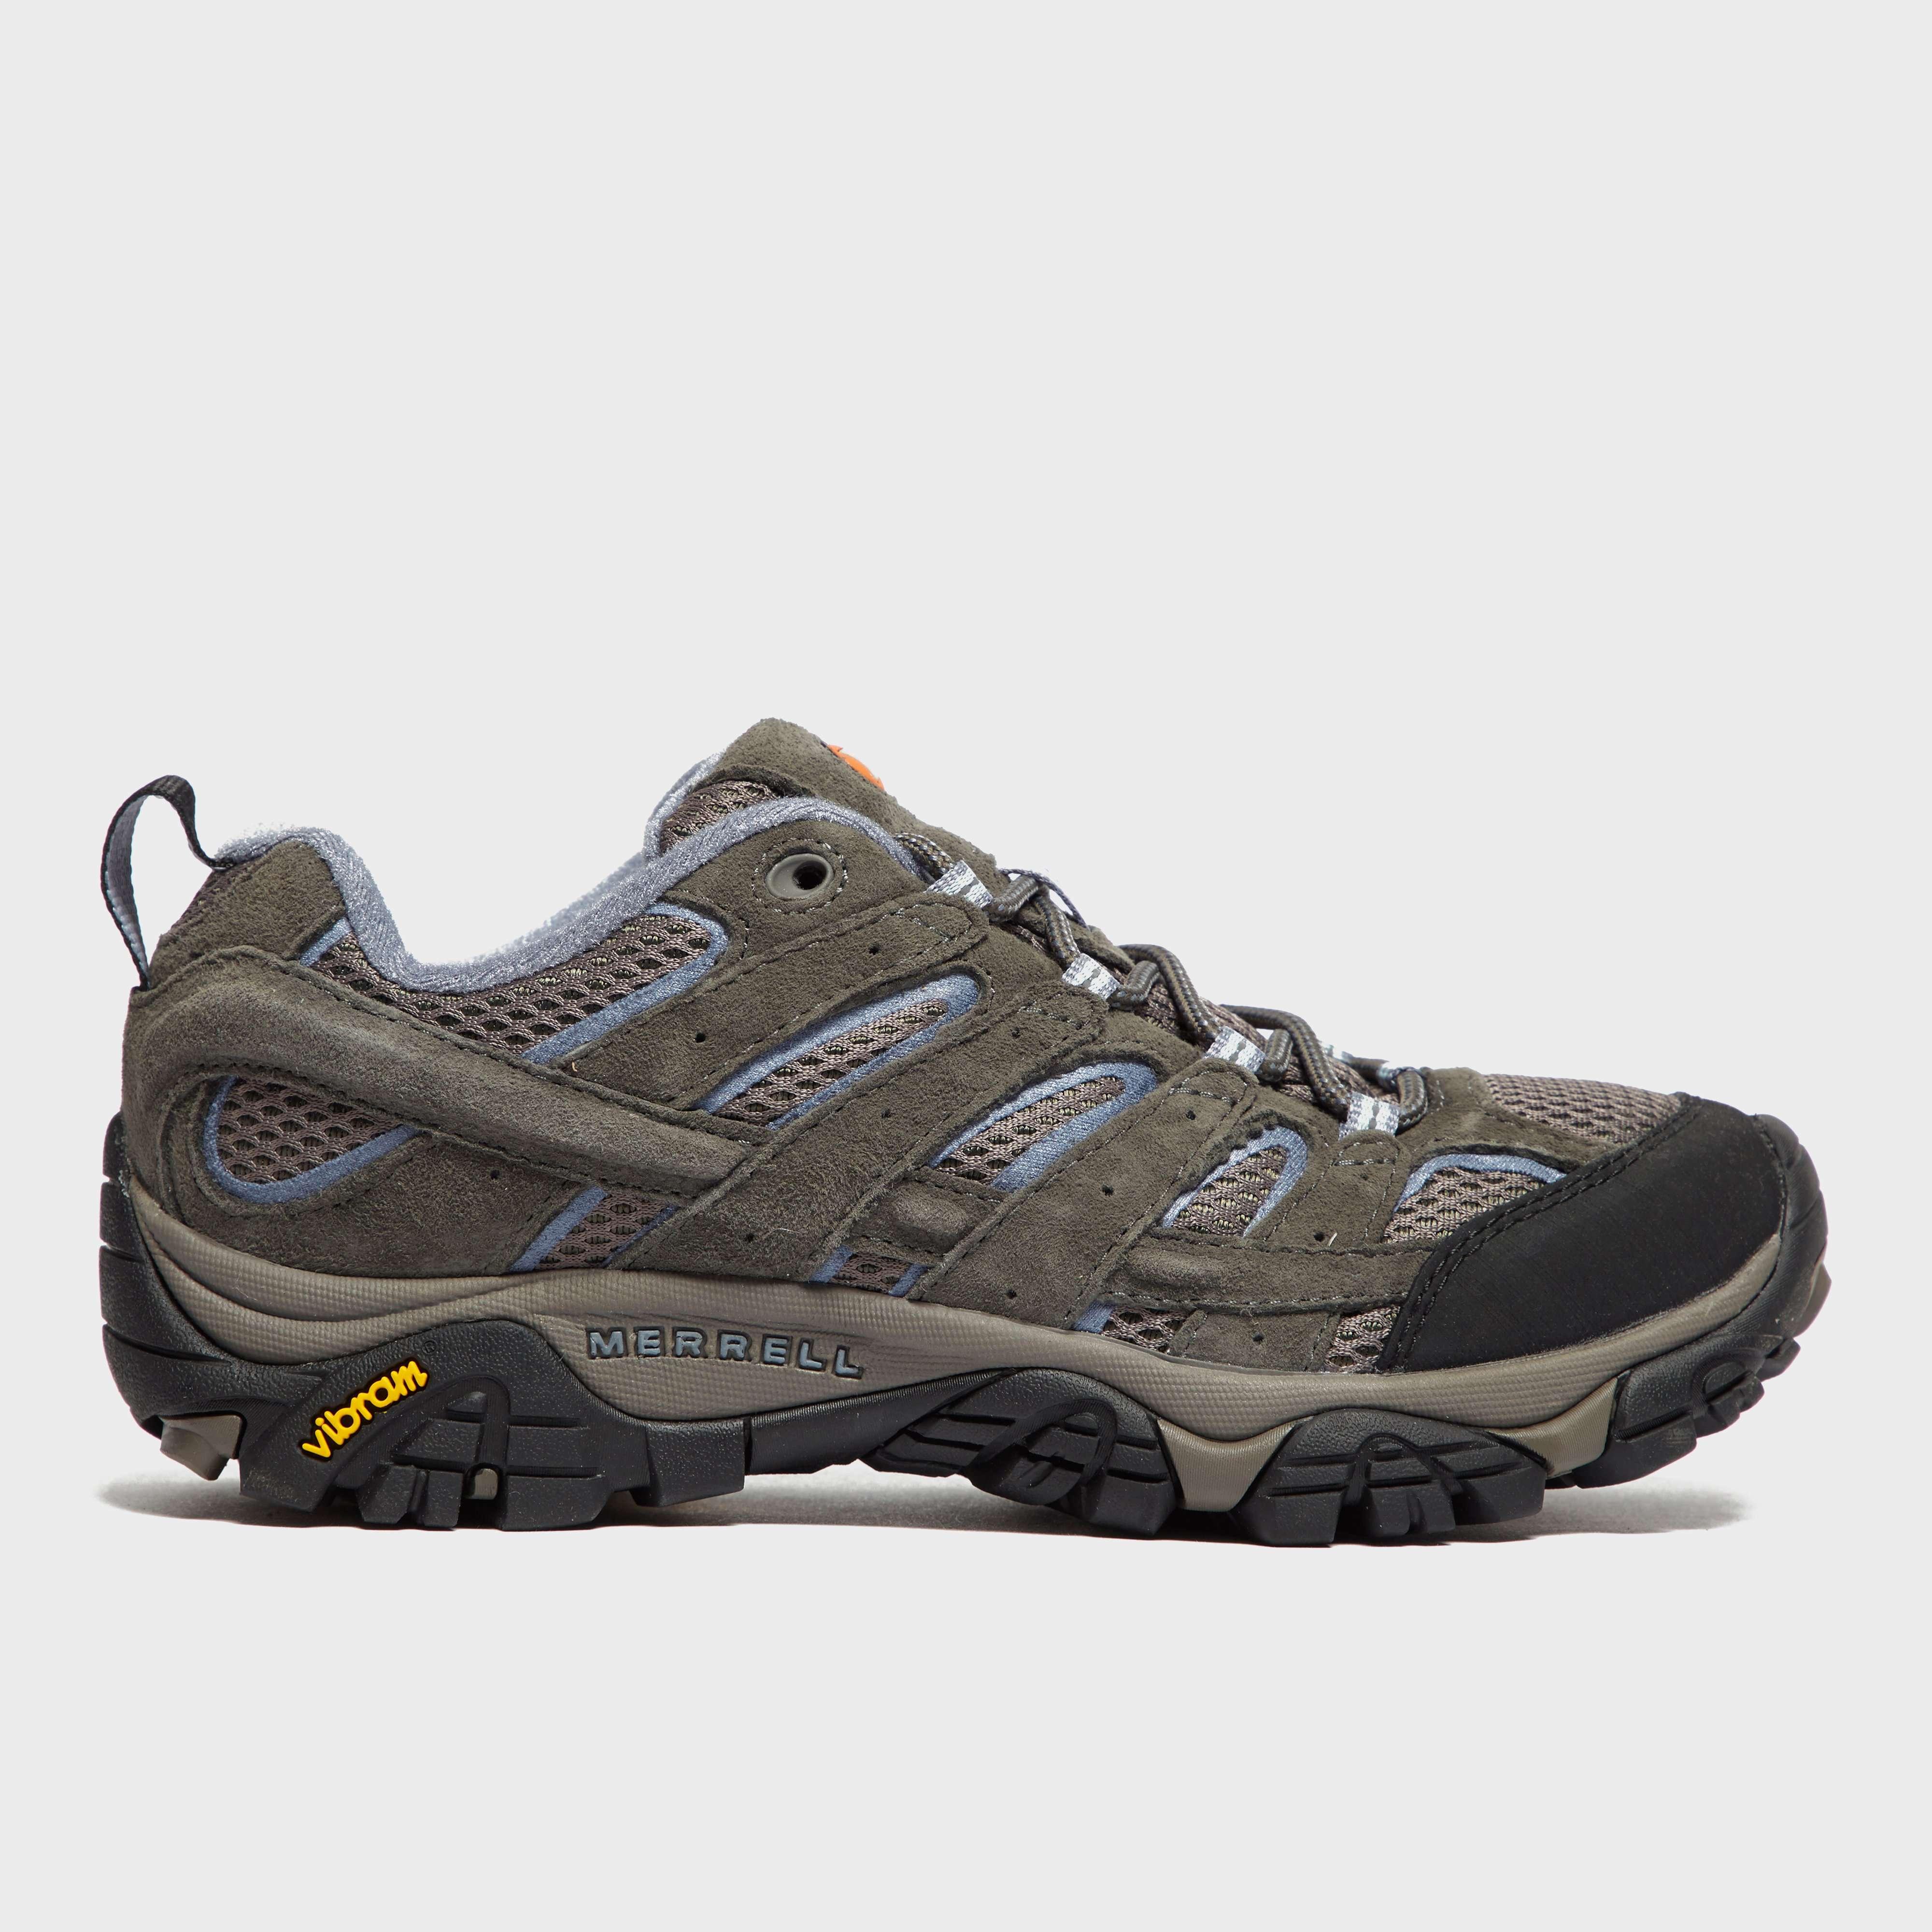 MERRELL Women's Moab 2 Ventilator Hiking Shoe